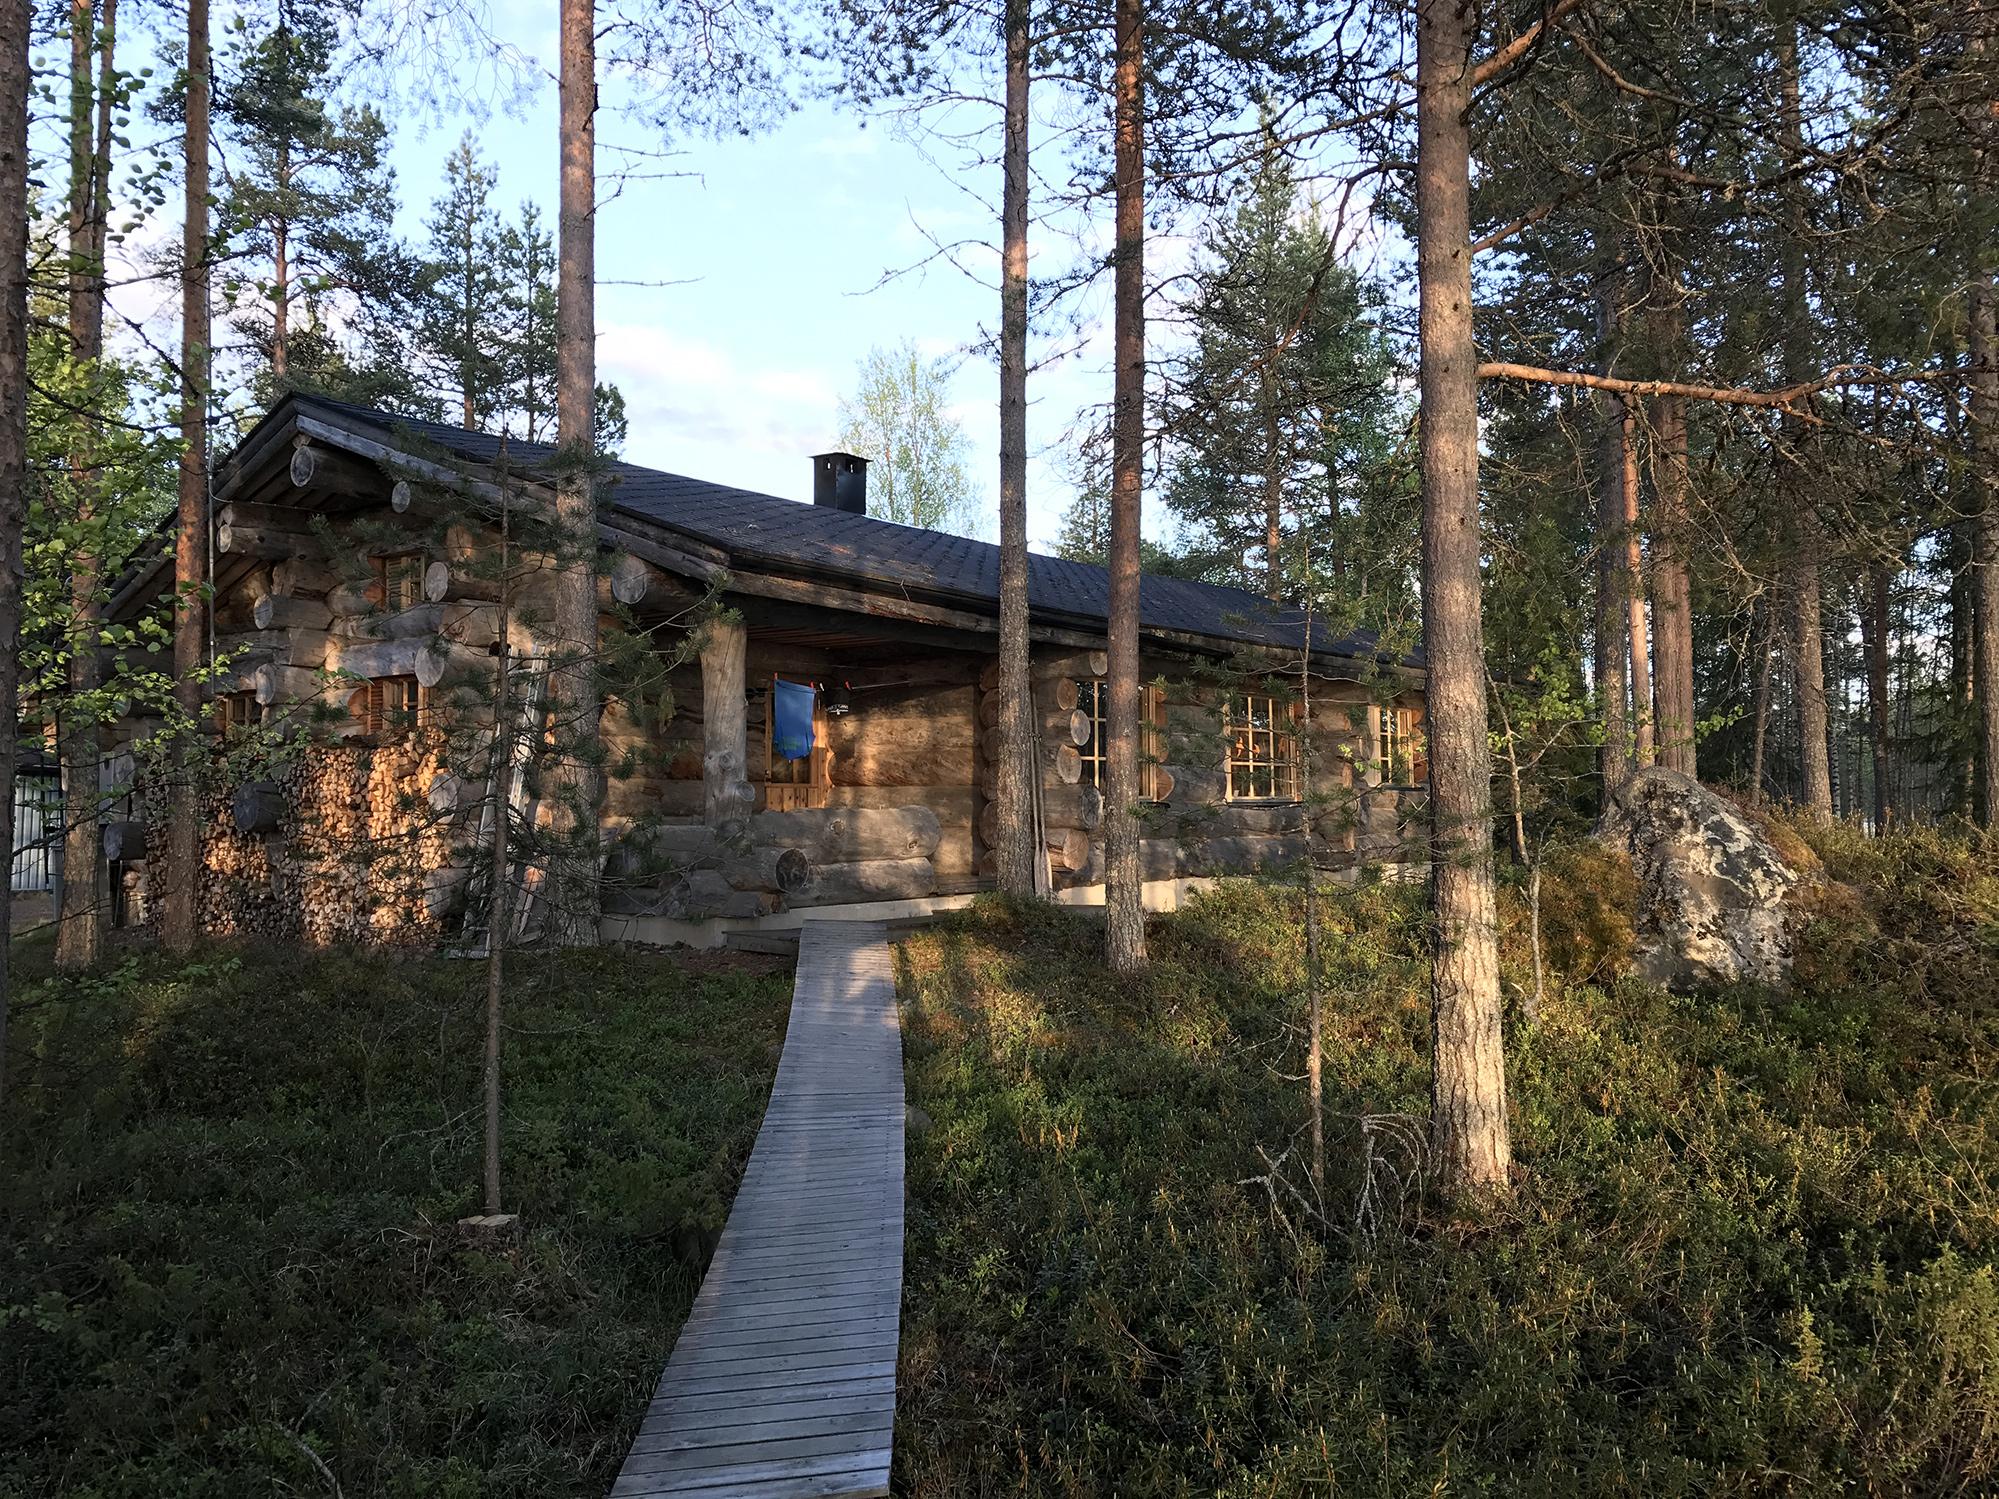 Anne & Axel's blockhouse